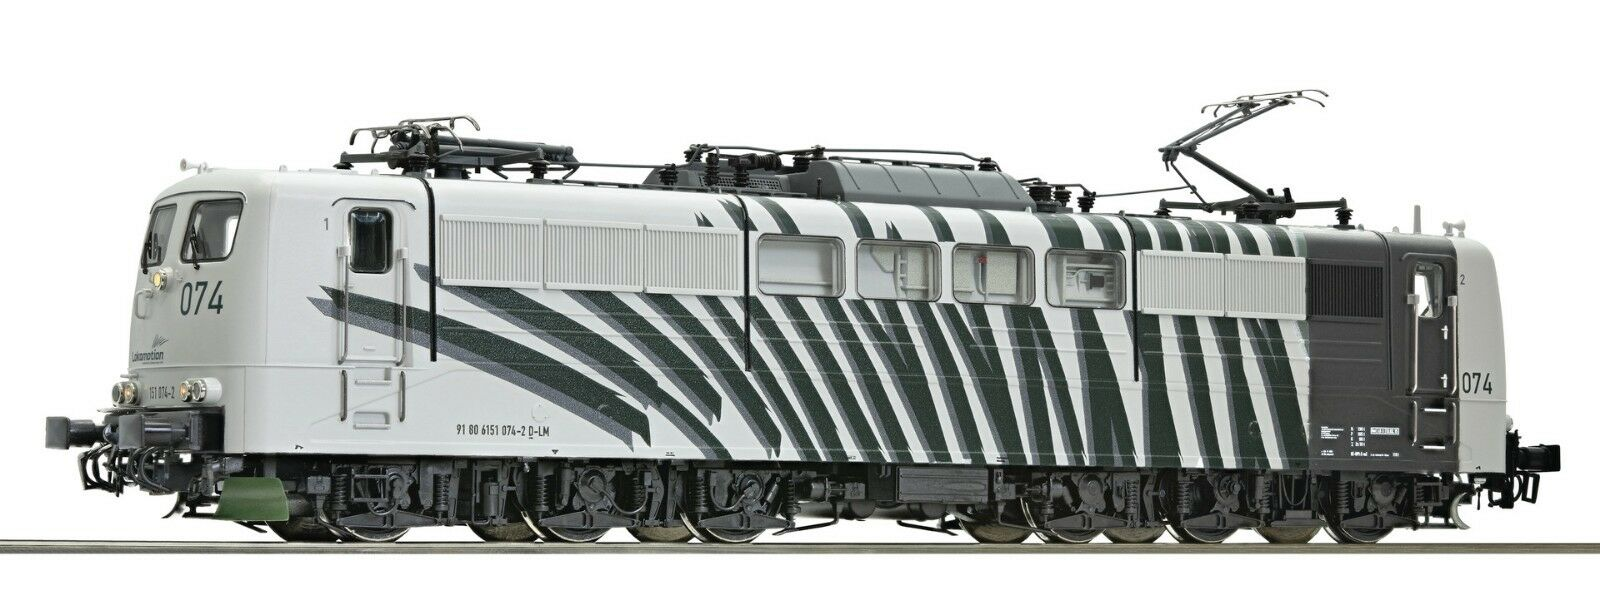 "ROCO 73438 151 074-2  Lokomotion design ""Zebra"" bianco fasce verdi,"